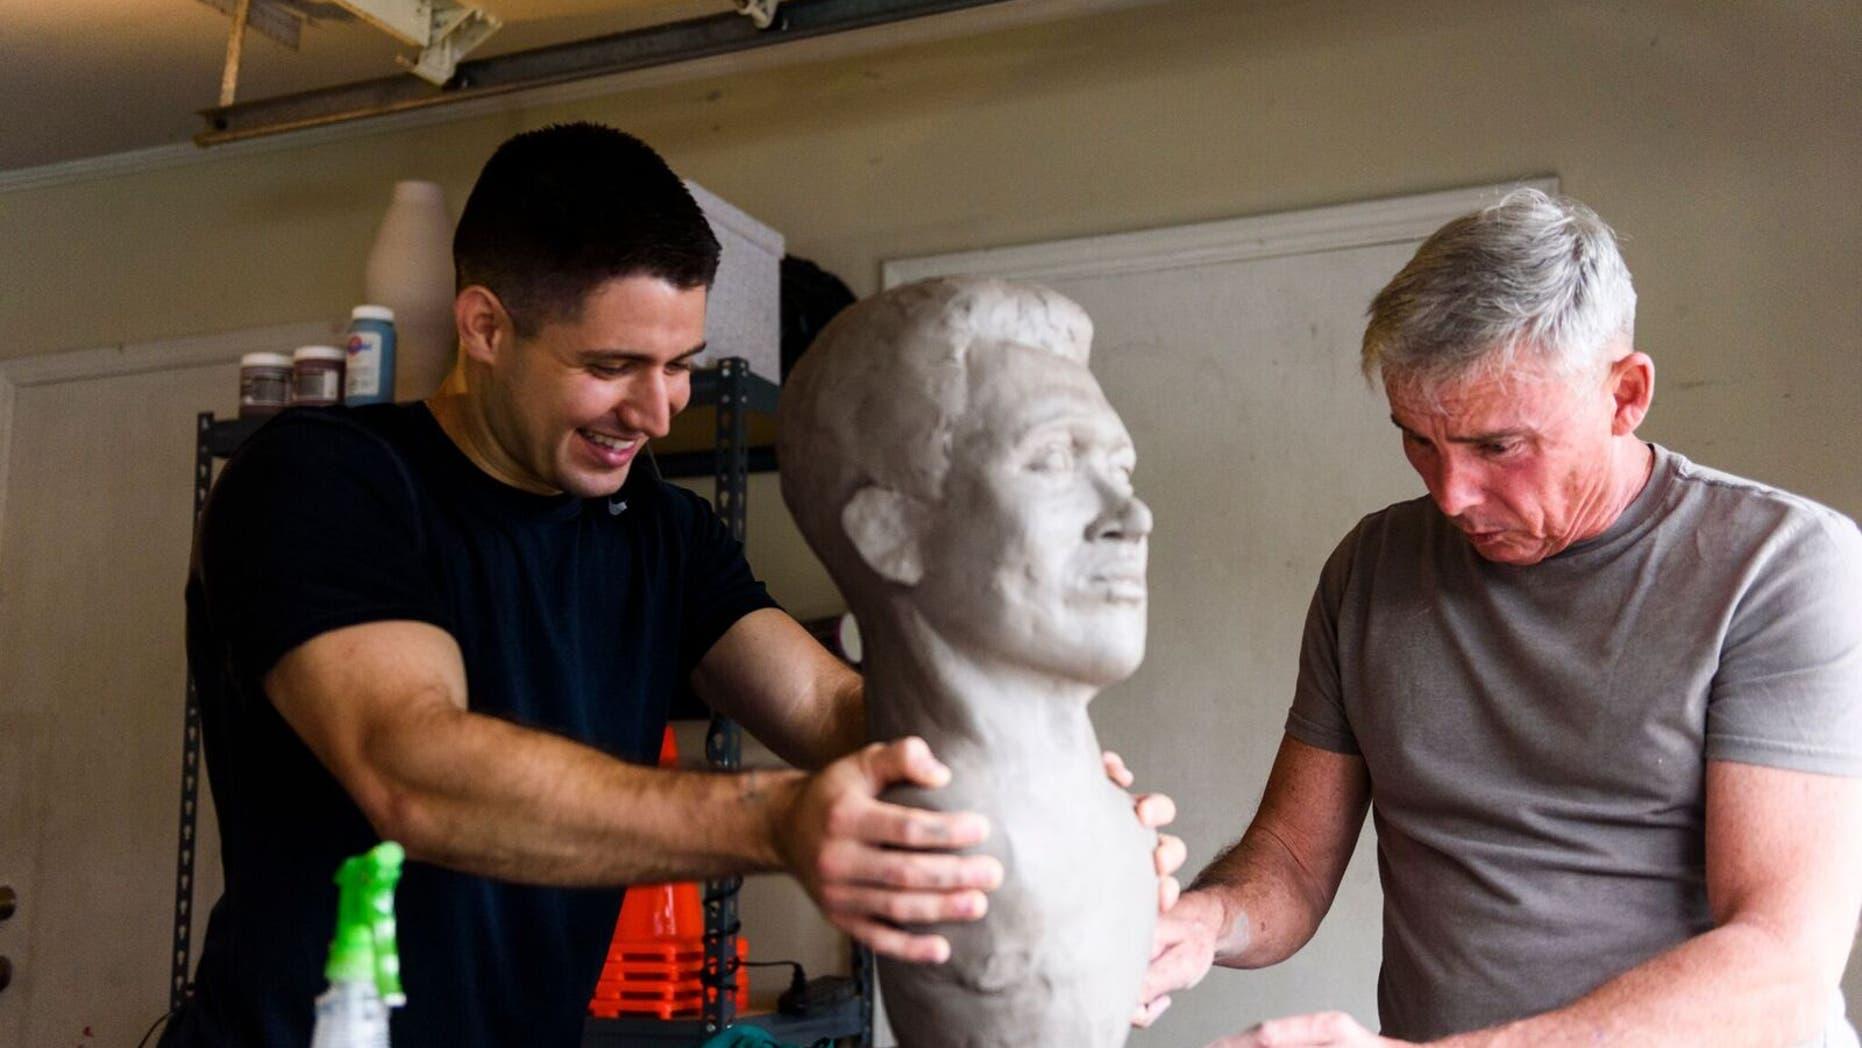 Lt. Steven Arango (left) with Alabama sculptor Lee Busby (right).